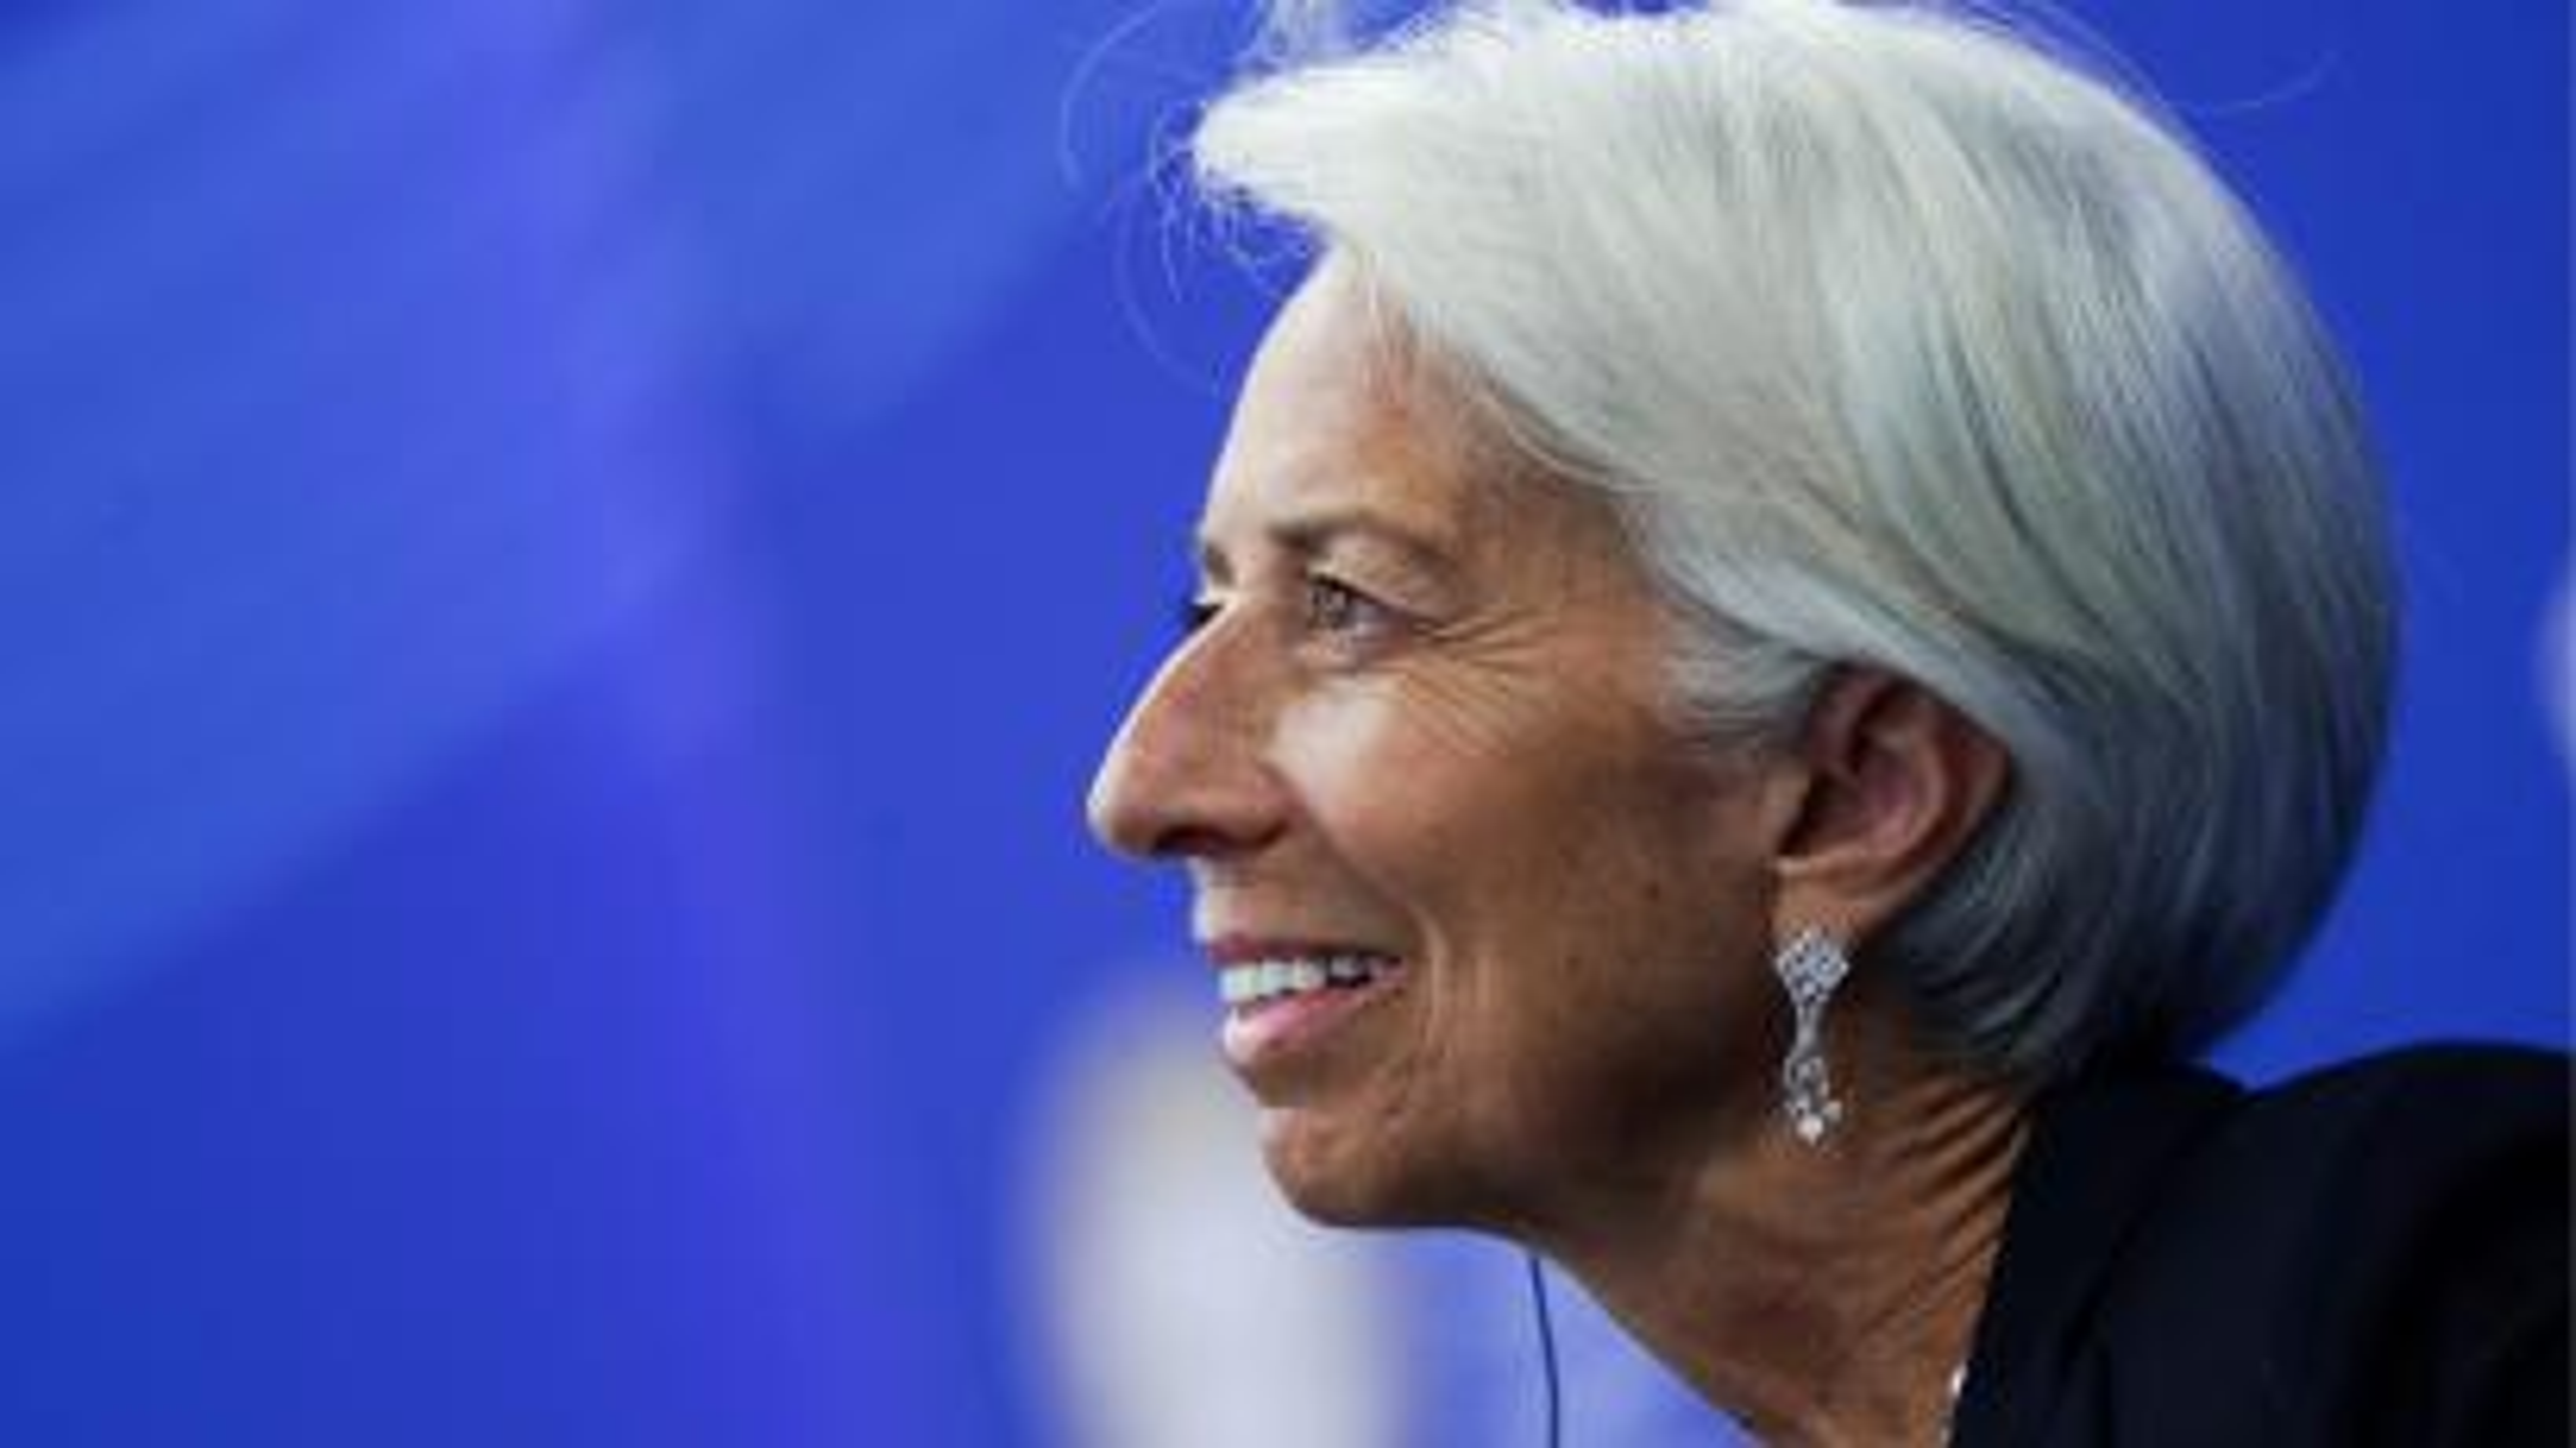 Christine Lagarde says women should embrace glass cliffs